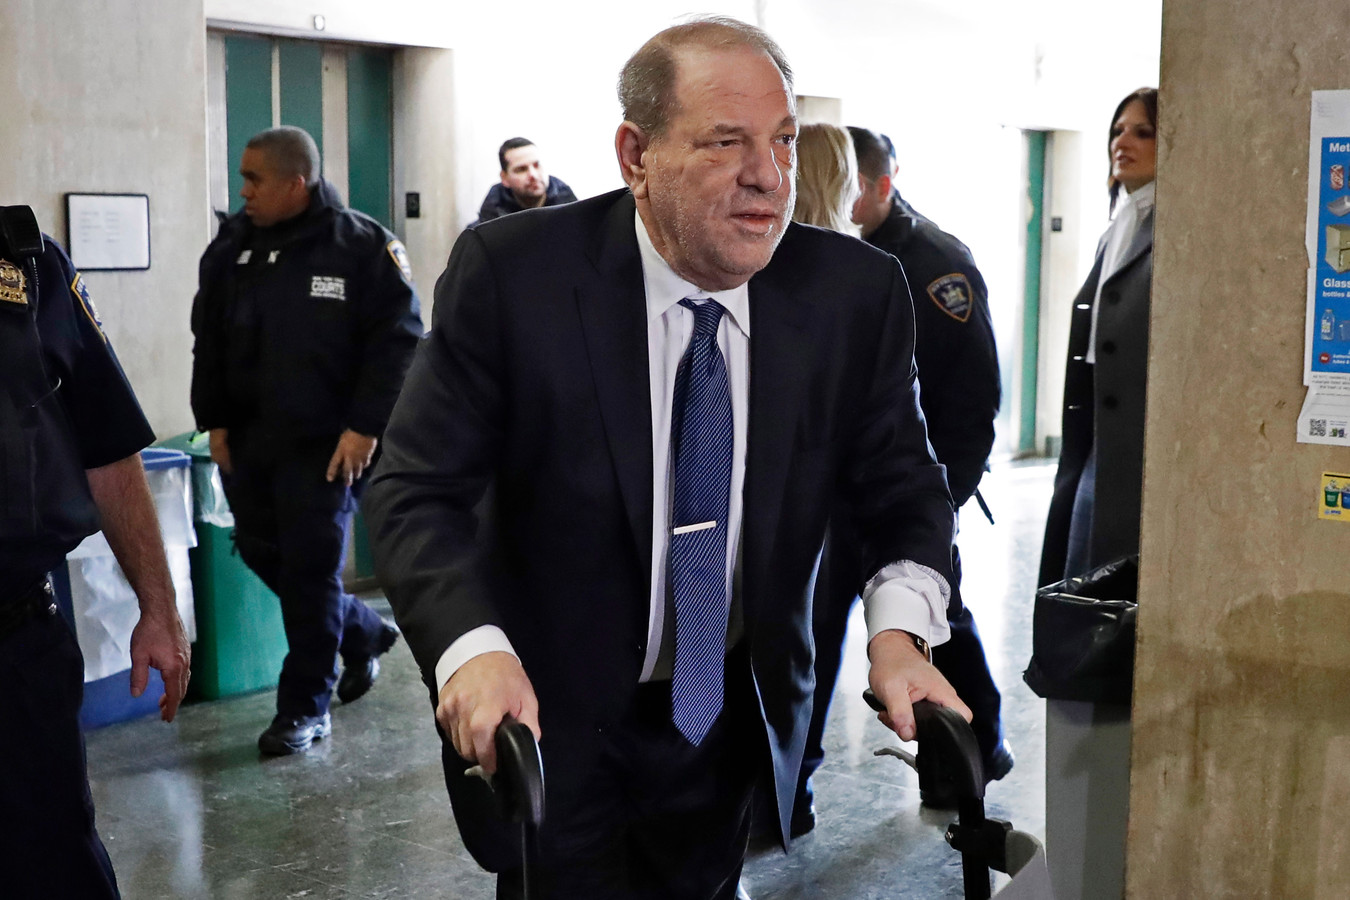 L'ex-producteur de cinéma Harvey Weinstein